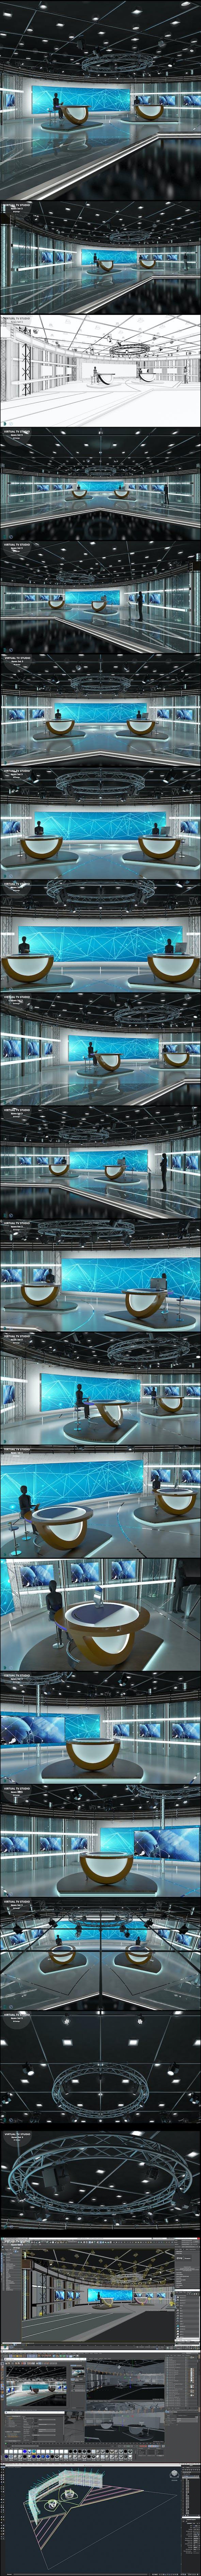 Virtual TV Studio News Set 3 - 3DOcean Item for Sale